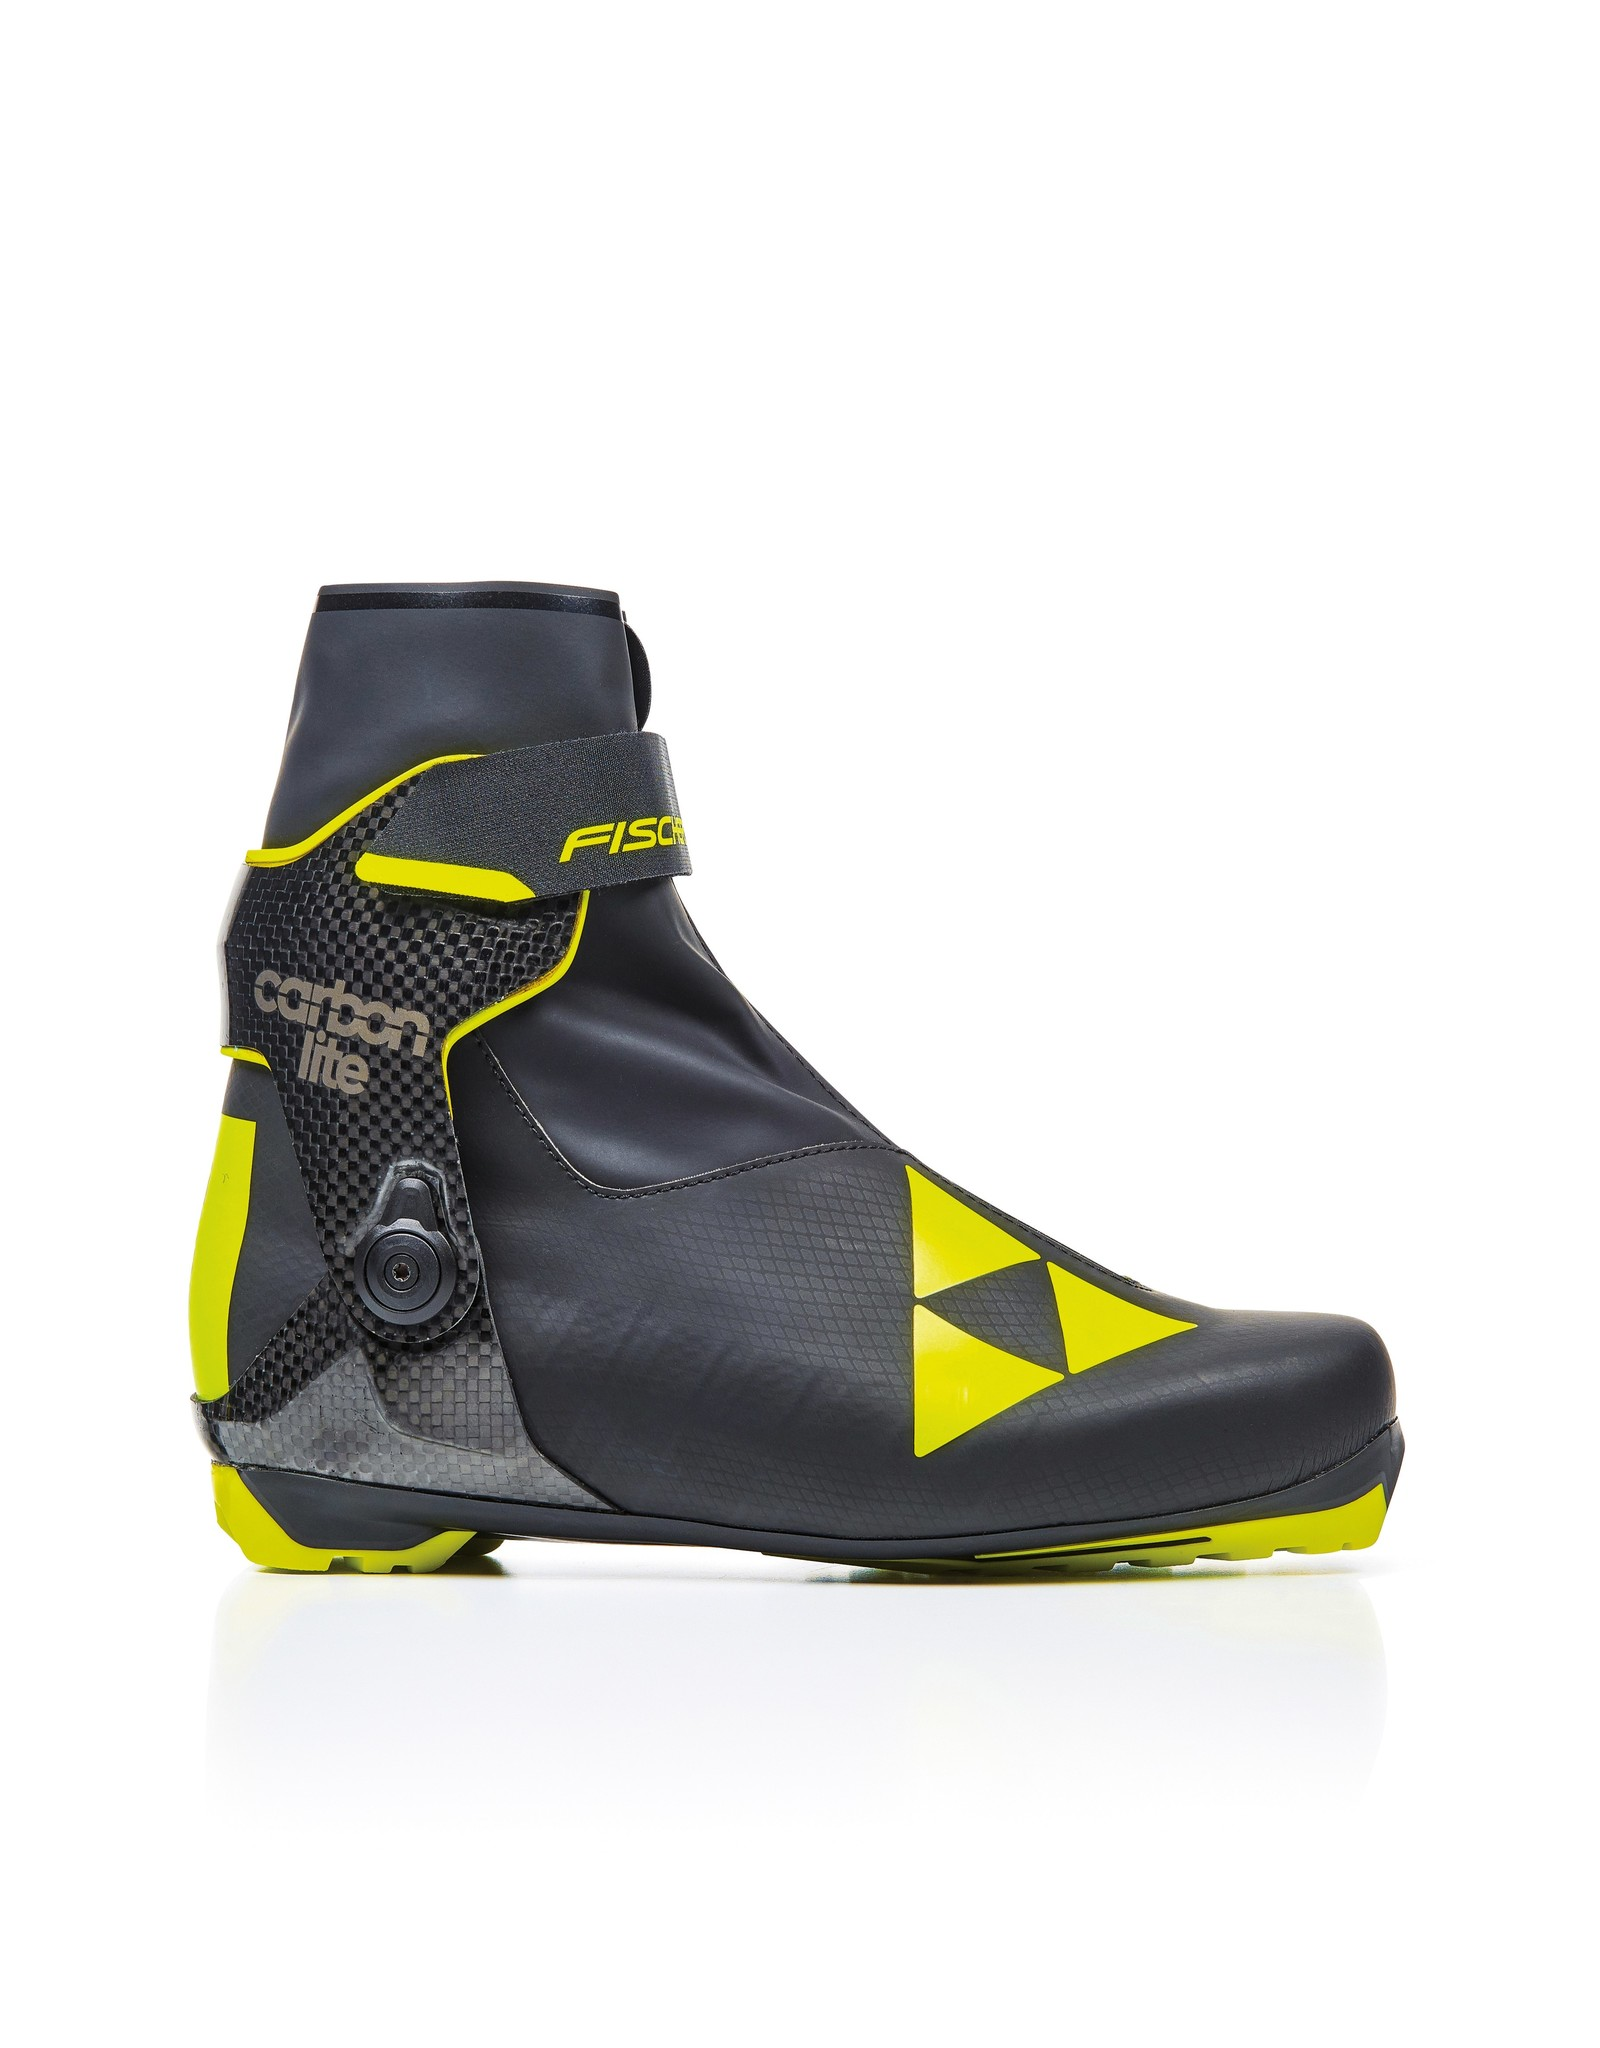 Fischer Carbonlite Skating